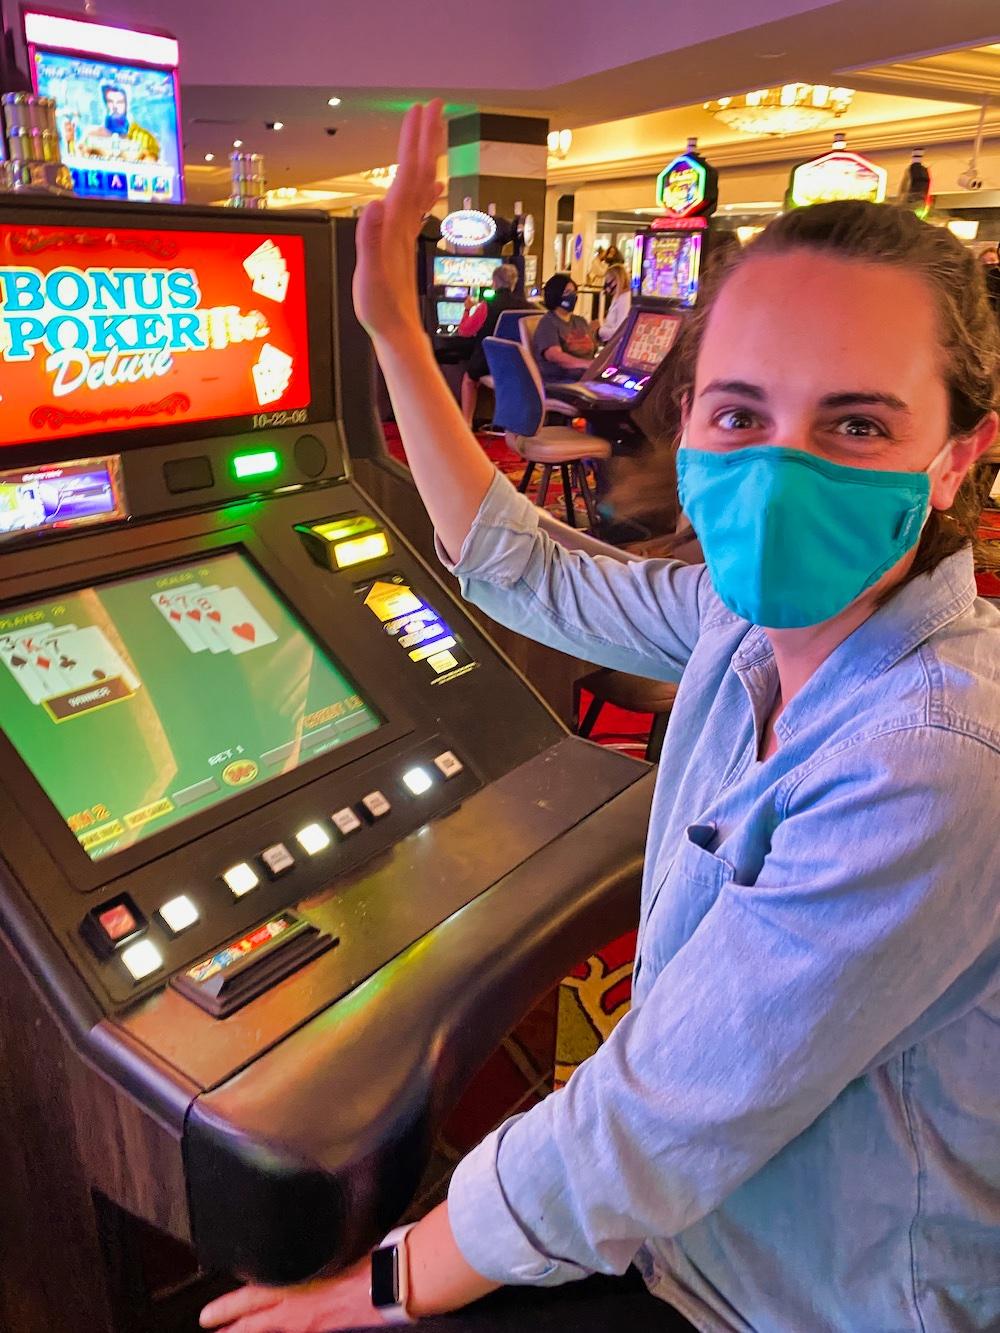 3 Days in Reno - Valerie Winning